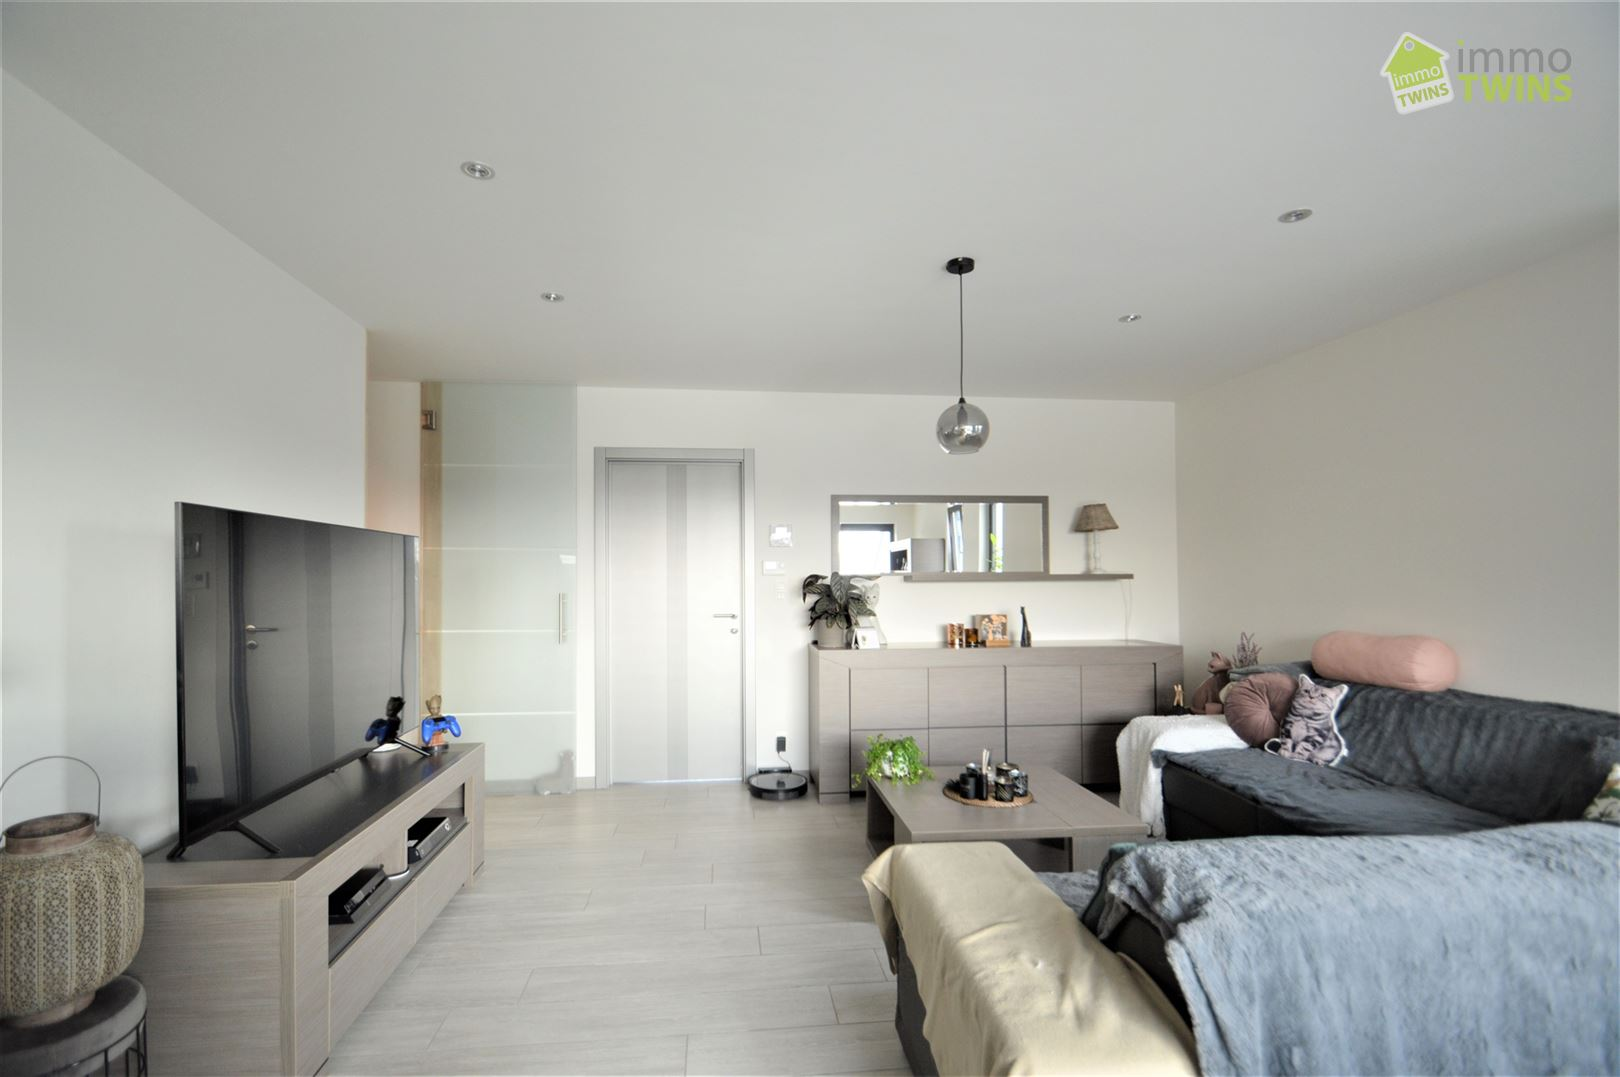 Foto 4 : Appartement te 9280 LEBBEKE (België) - Prijs € 810